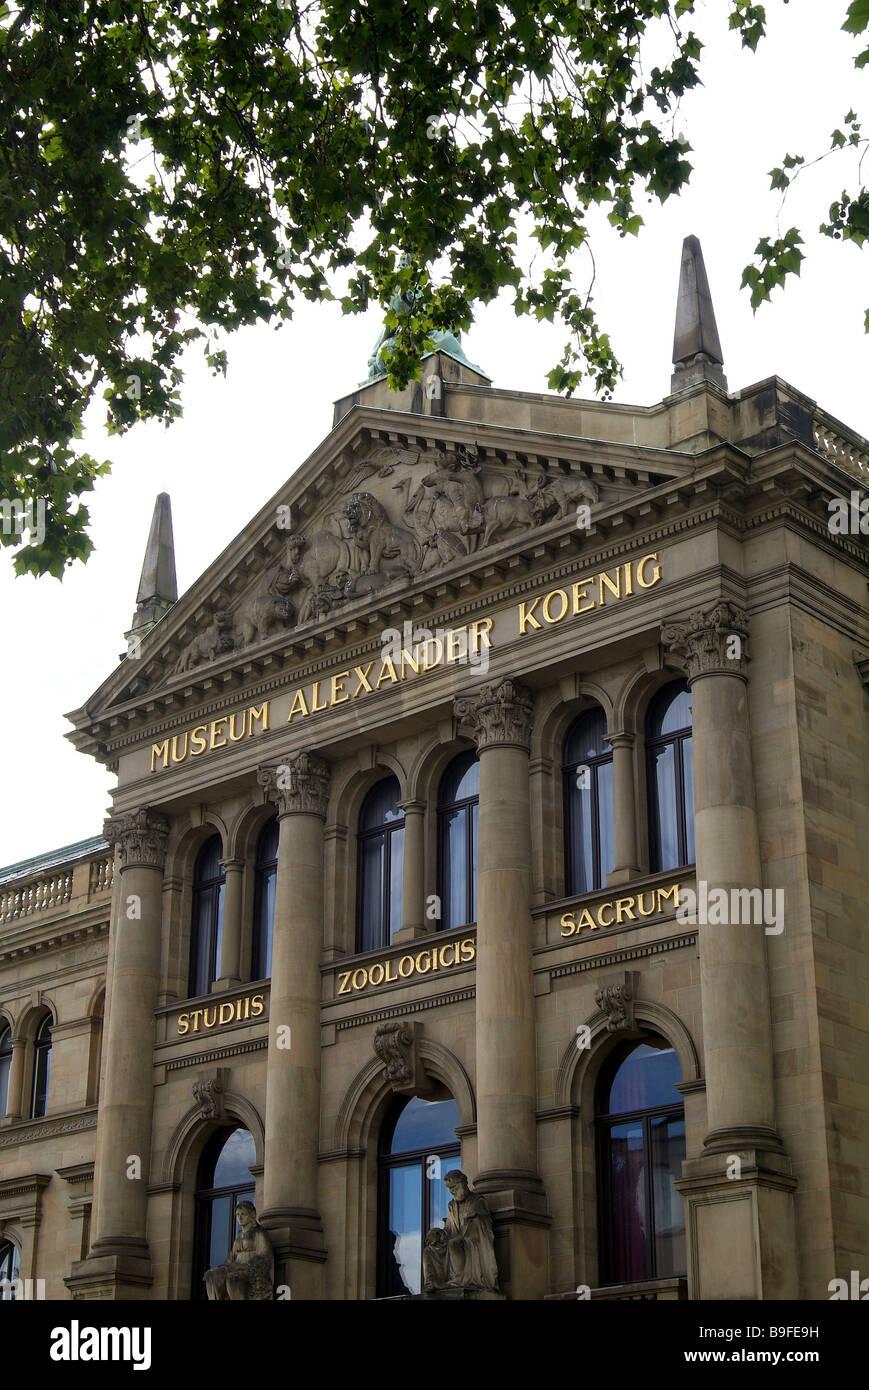 Germany Bonn museum Alexander Koenig - Stock Image